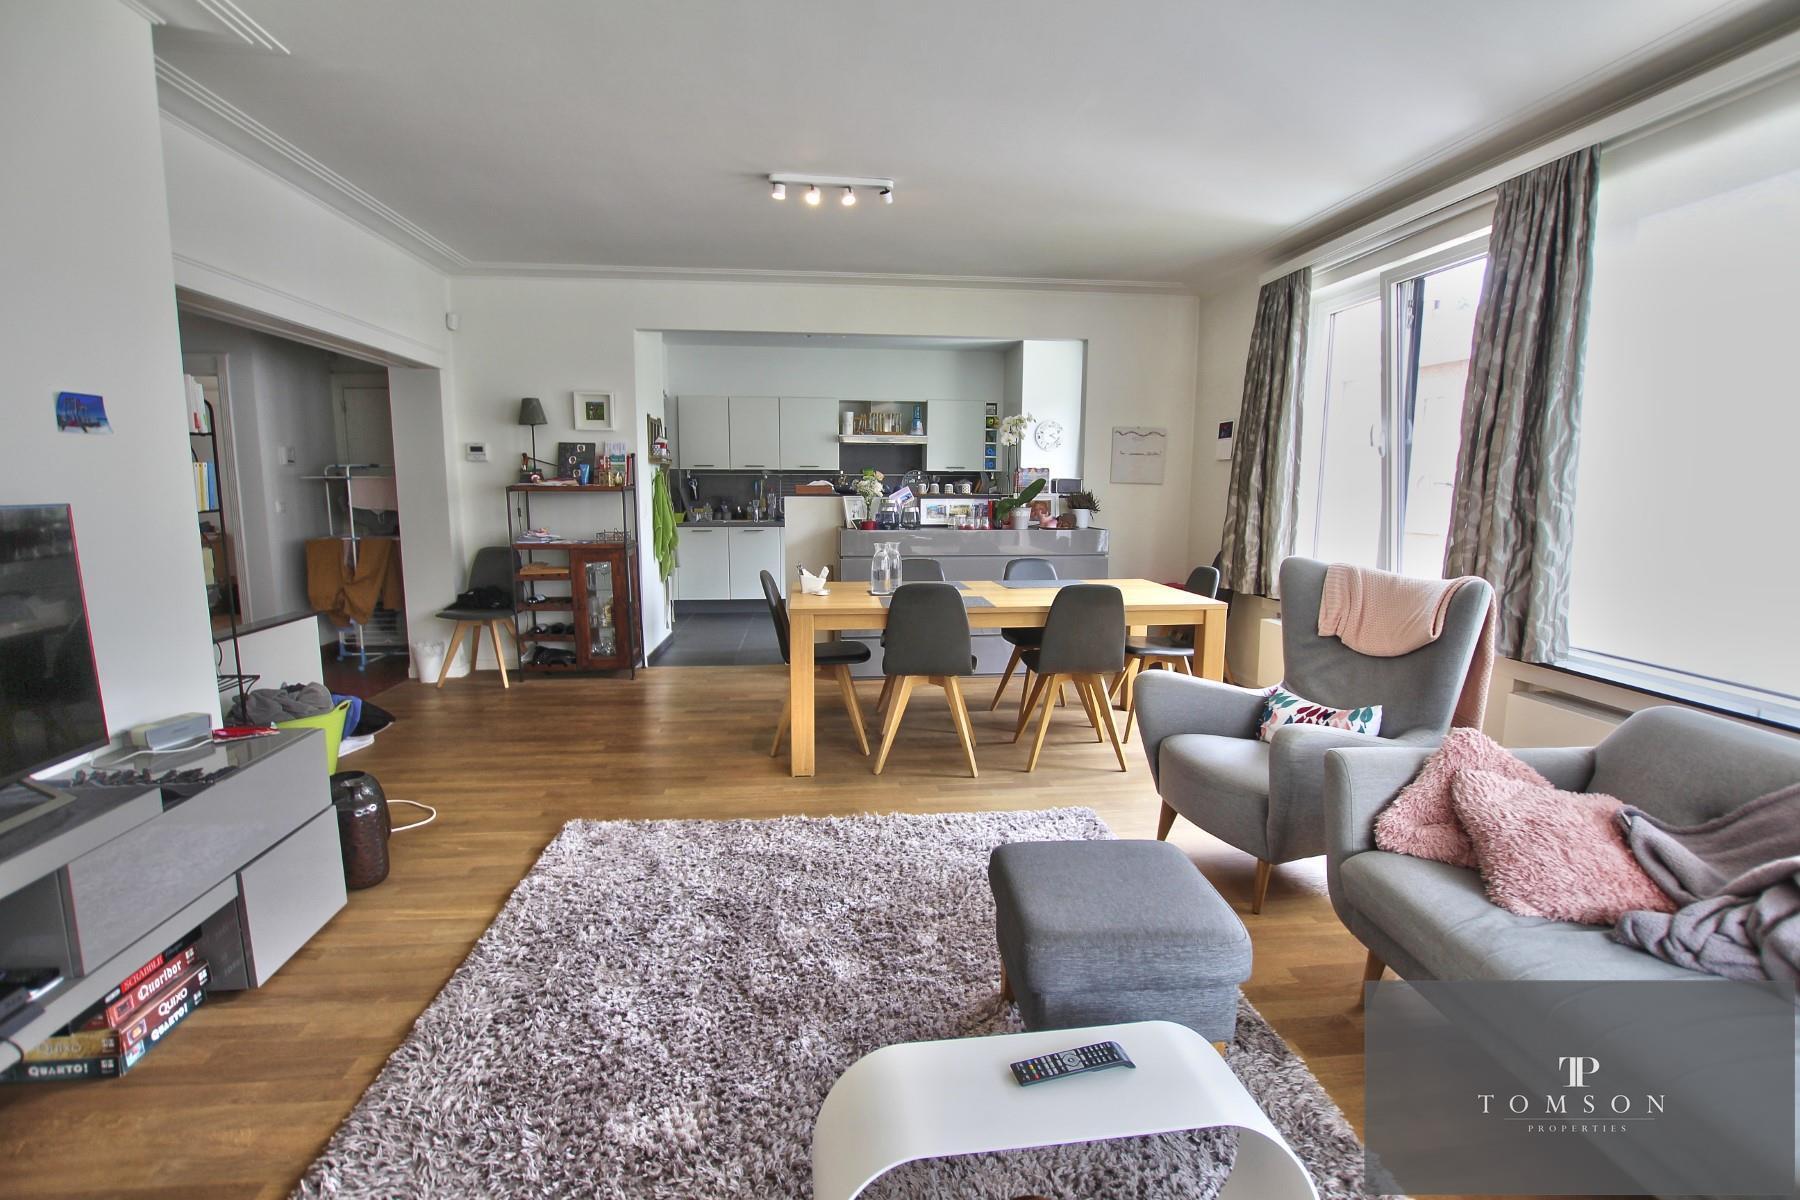 Appartement exceptionnel - Woluwe-Saint-Pierre - #4349832-1